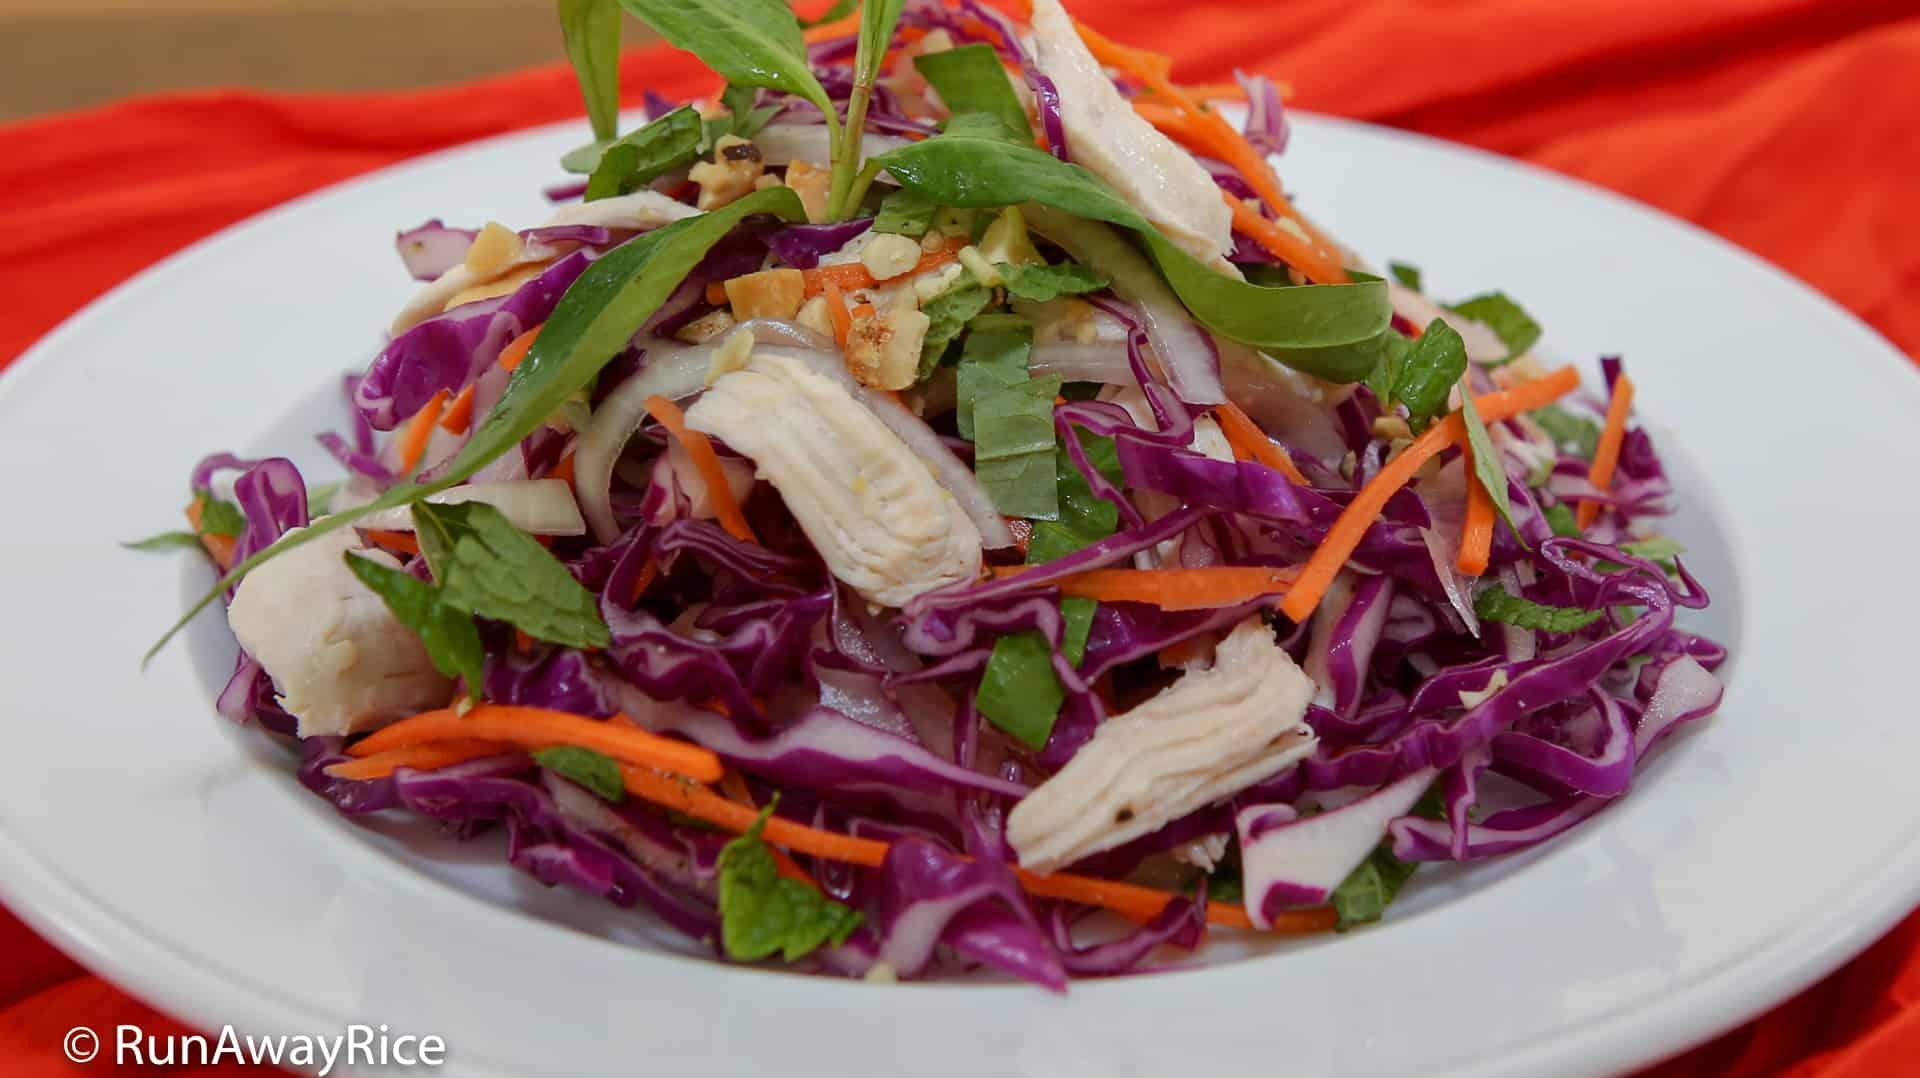 Purple Cabbage Chicken Salad (Goi Ga Bap Cai Tim) - Refreshing, Crispy Salad | recipe from runawayrice.com